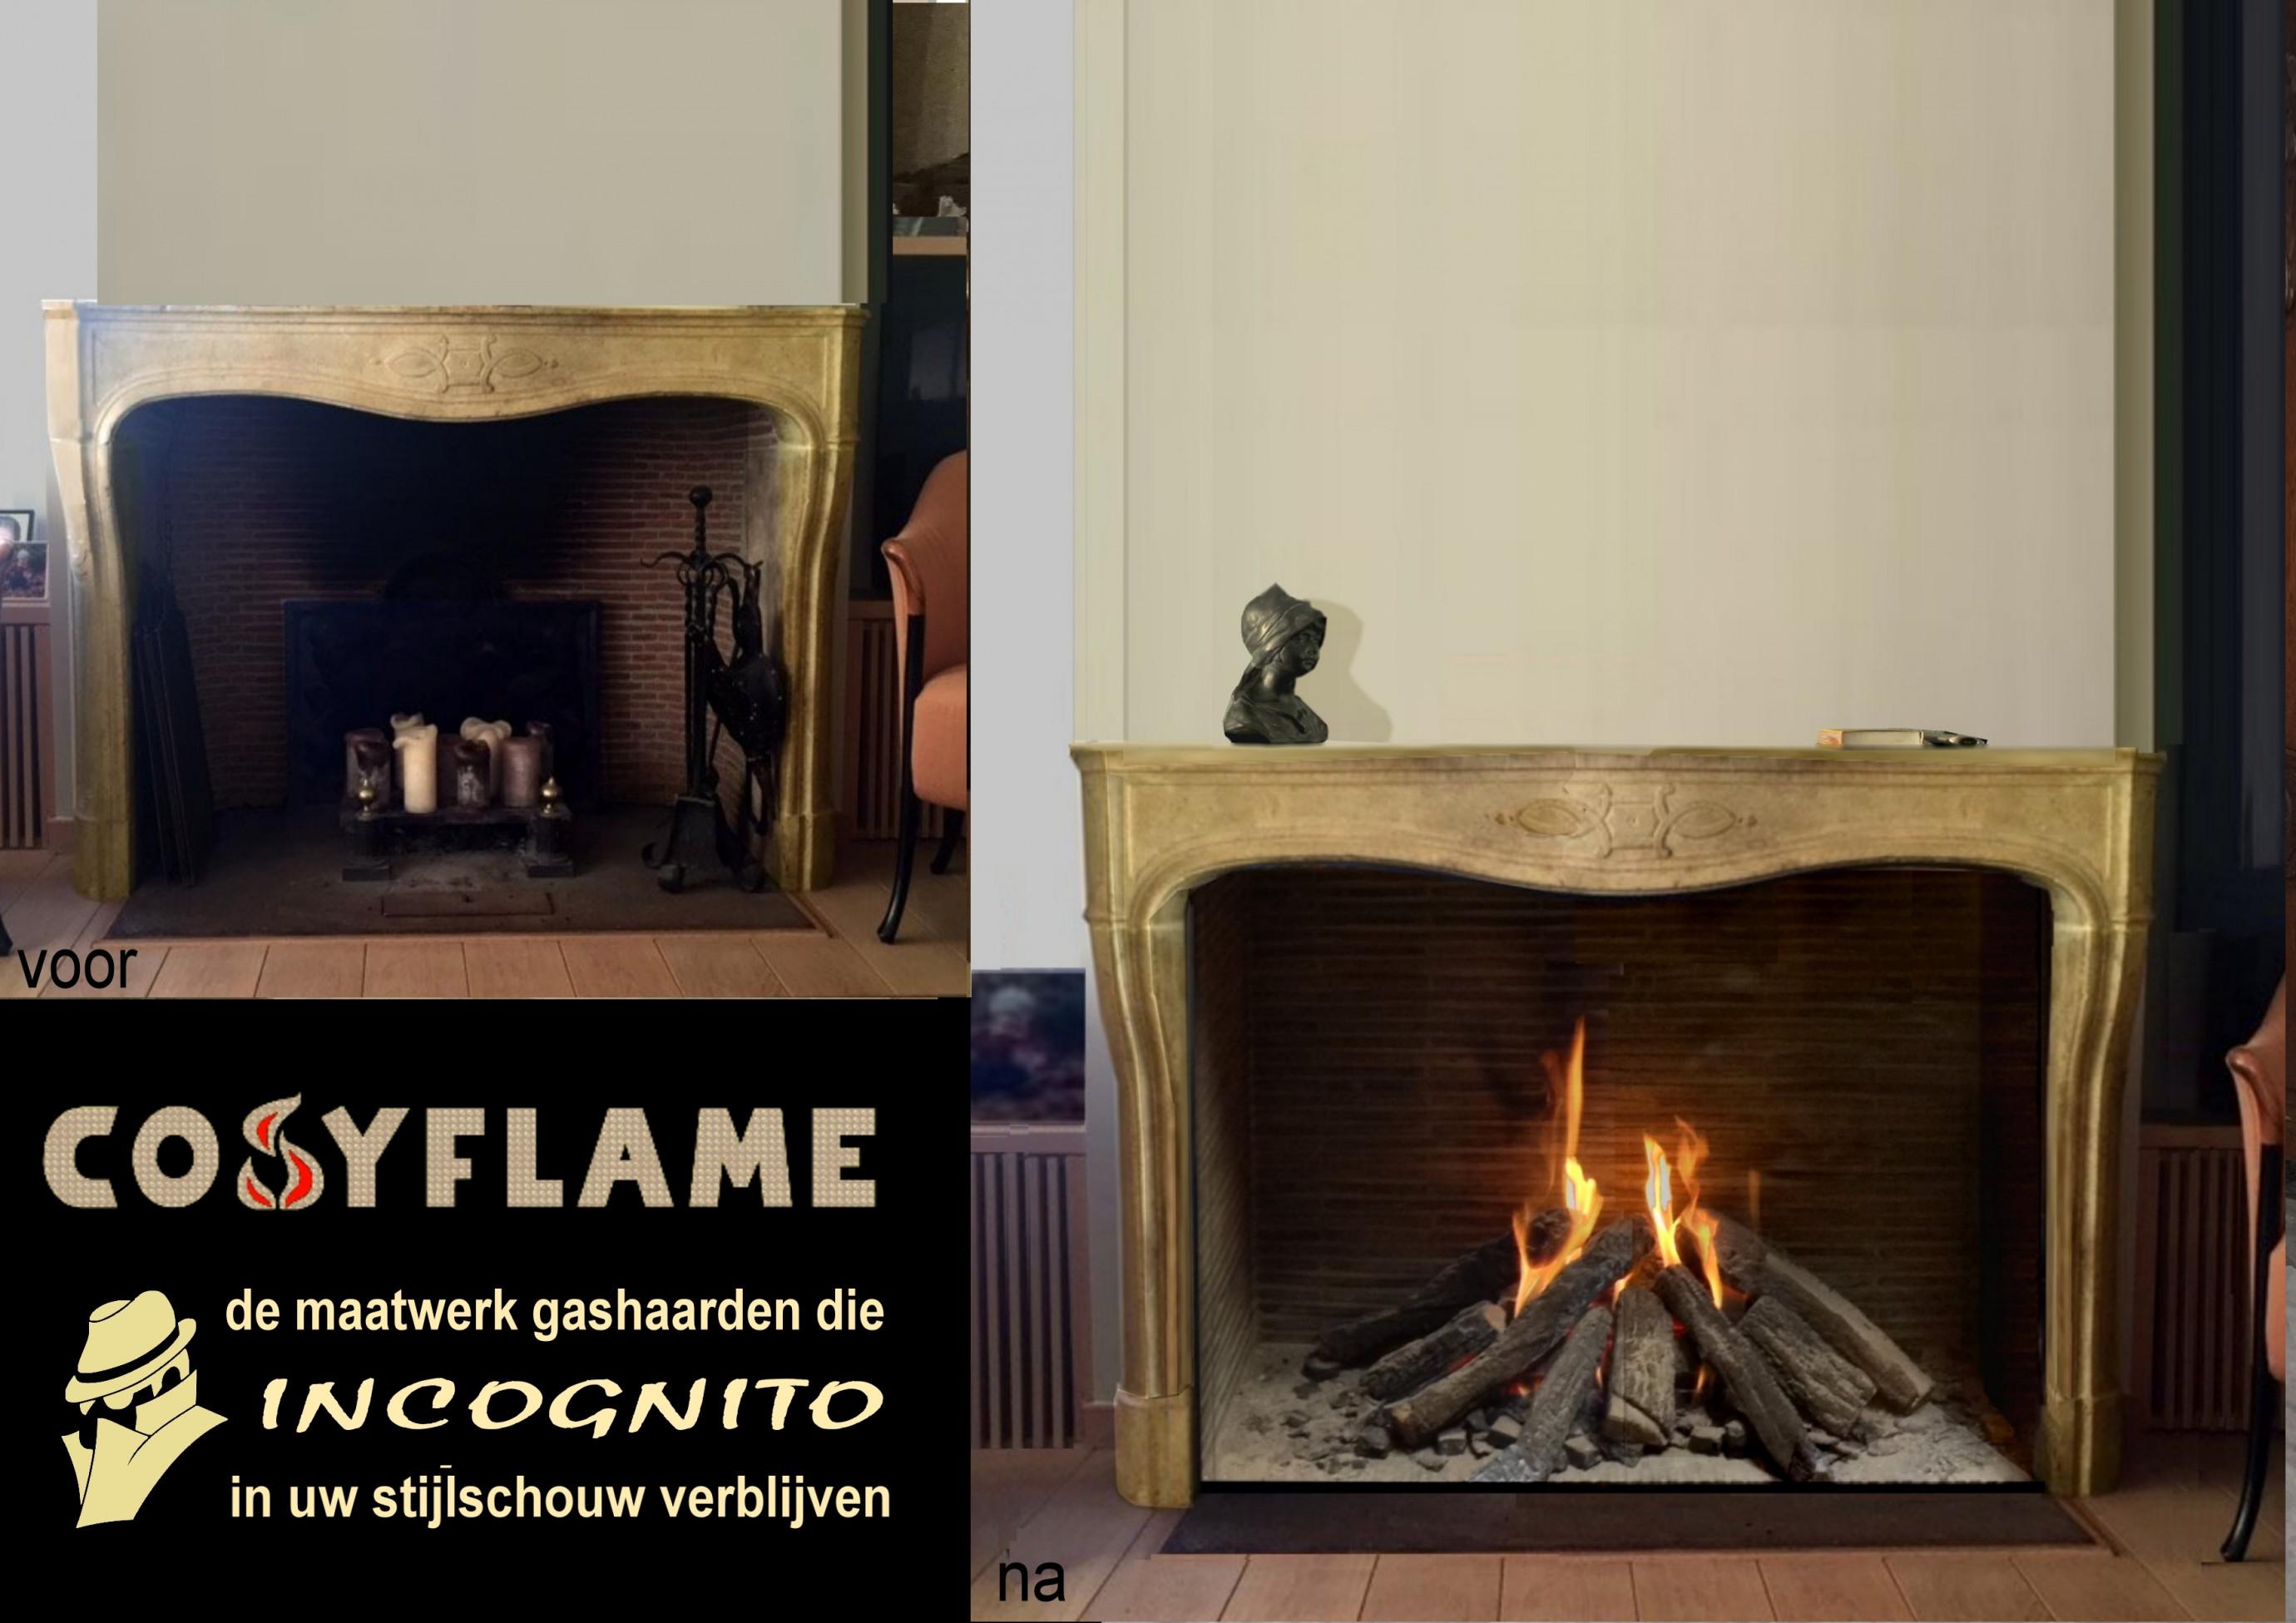 Cosyflame-2018-11-25 voor-na SP LXV met kaarsen A4.jpg